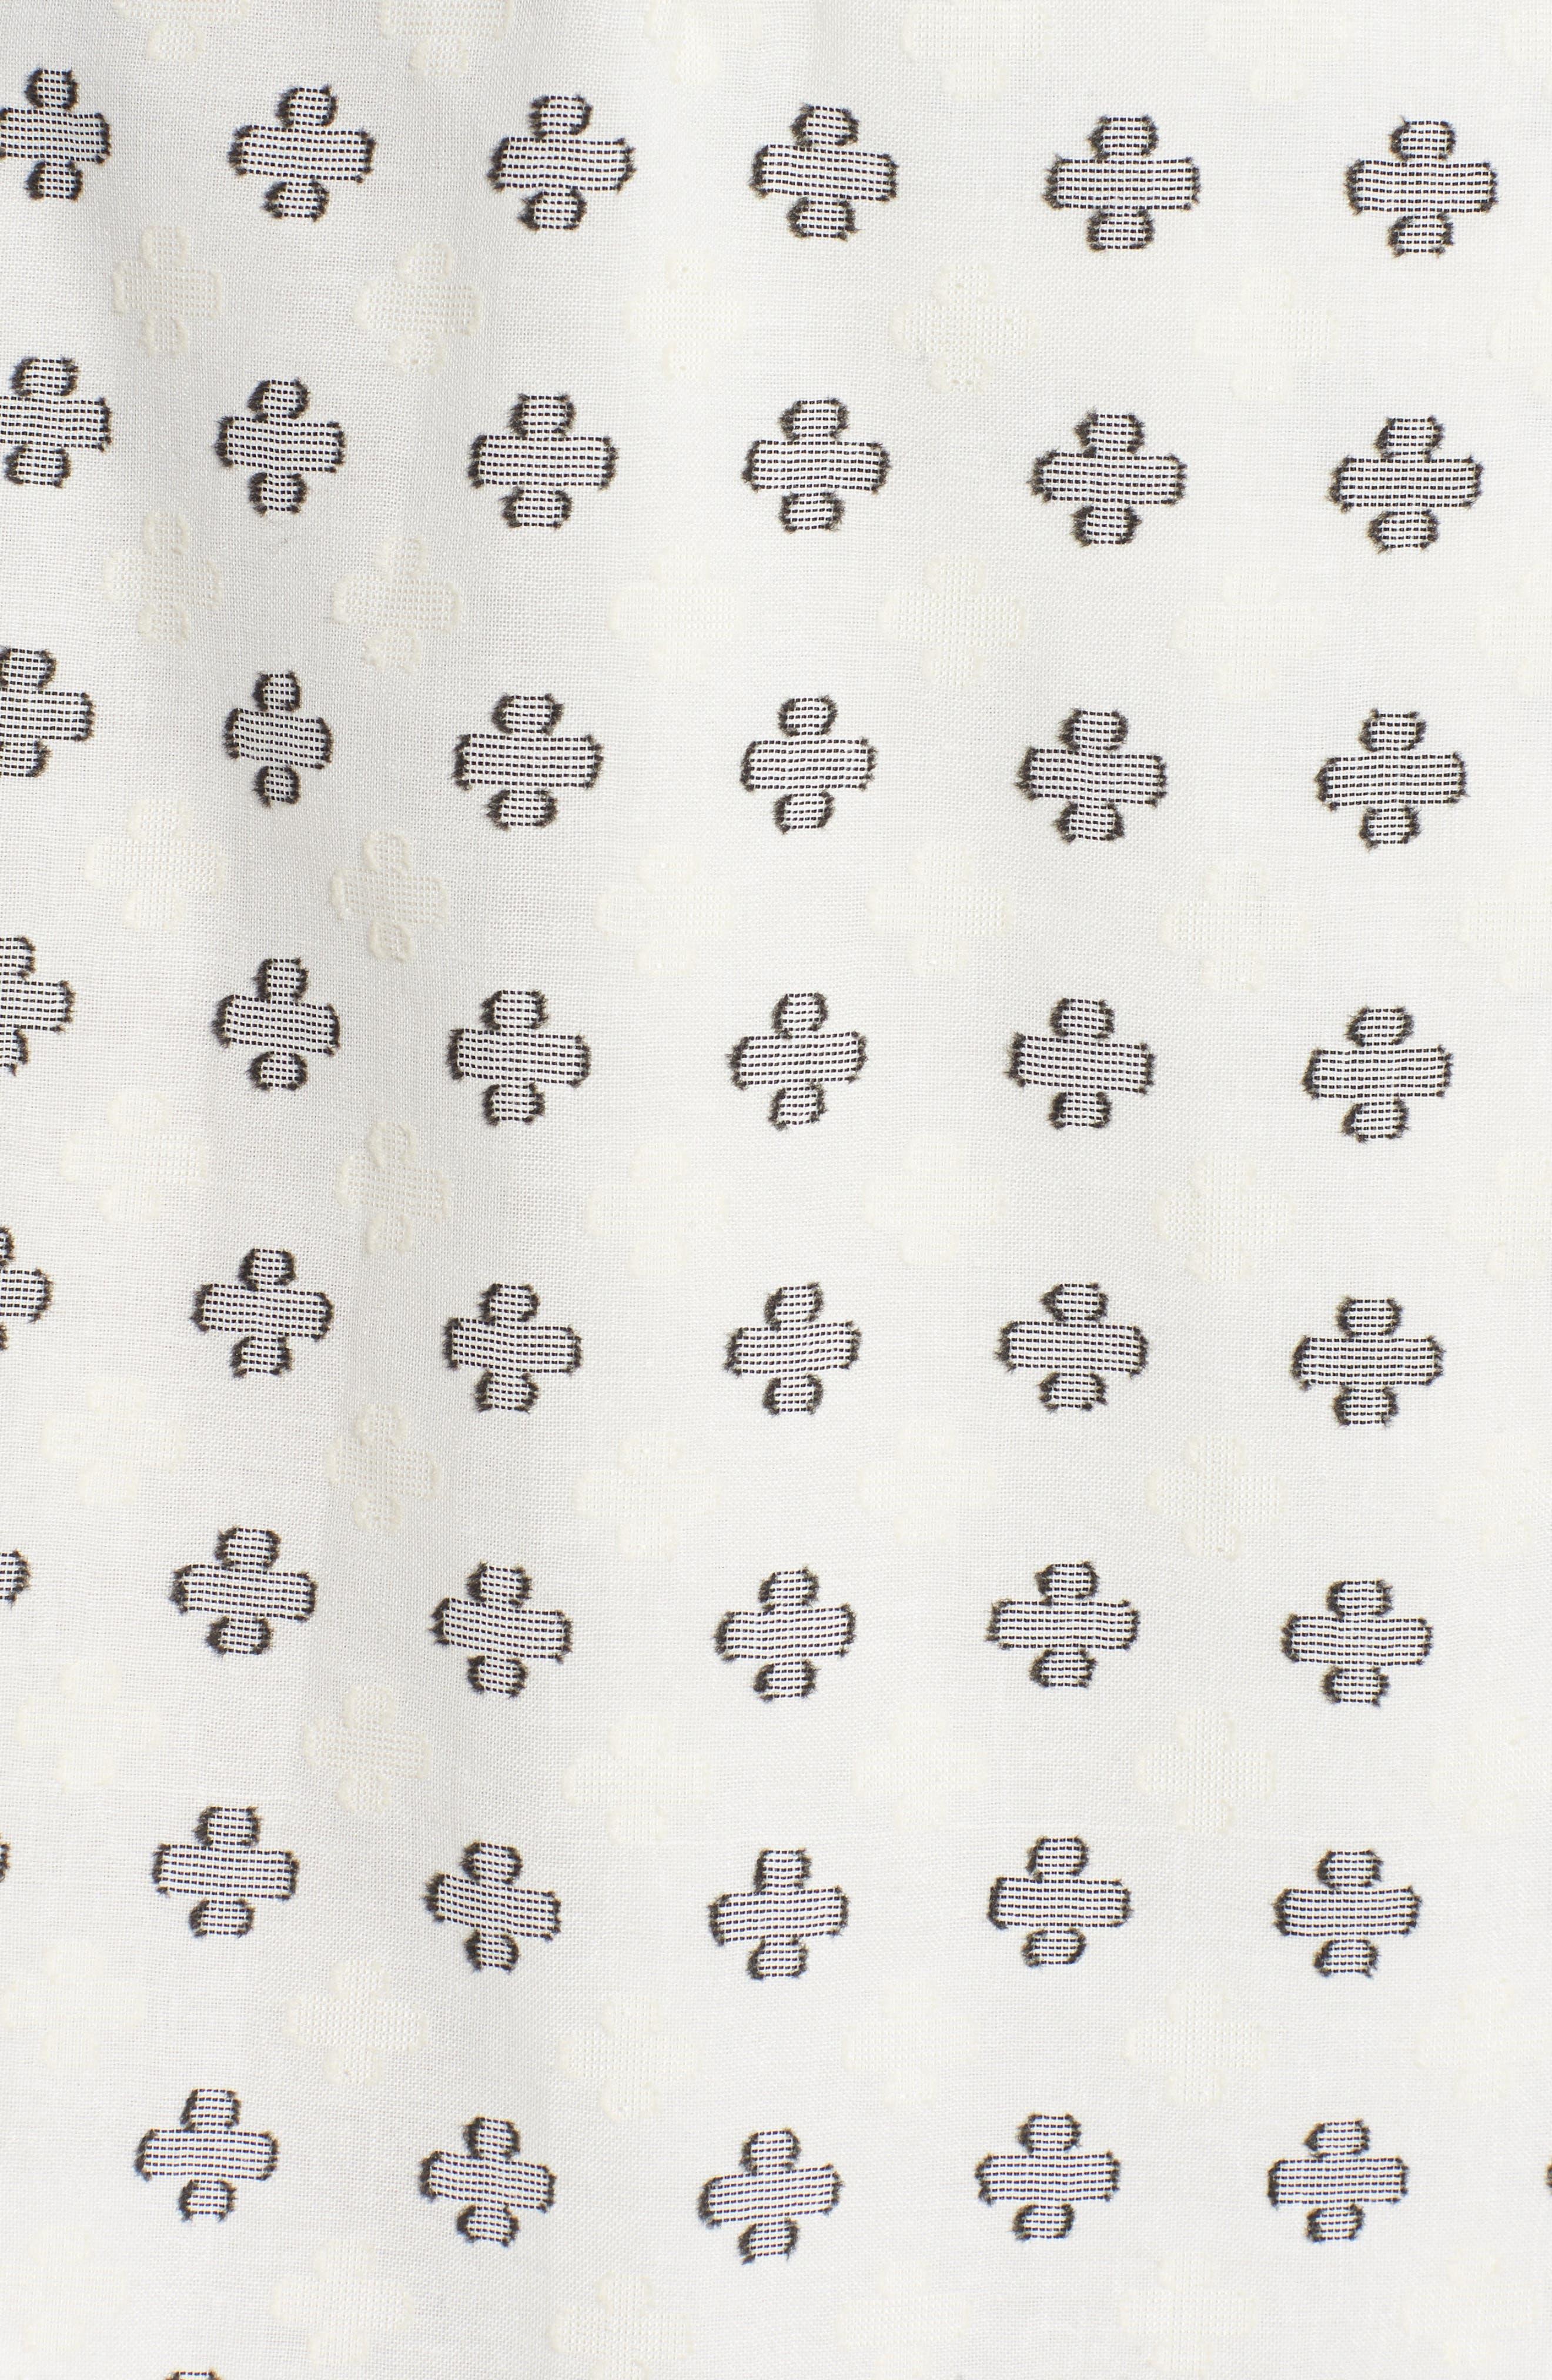 Ruth Wrap Minidress,                             Alternate thumbnail 6, color,                             BLACK AND WHITE CLOVER